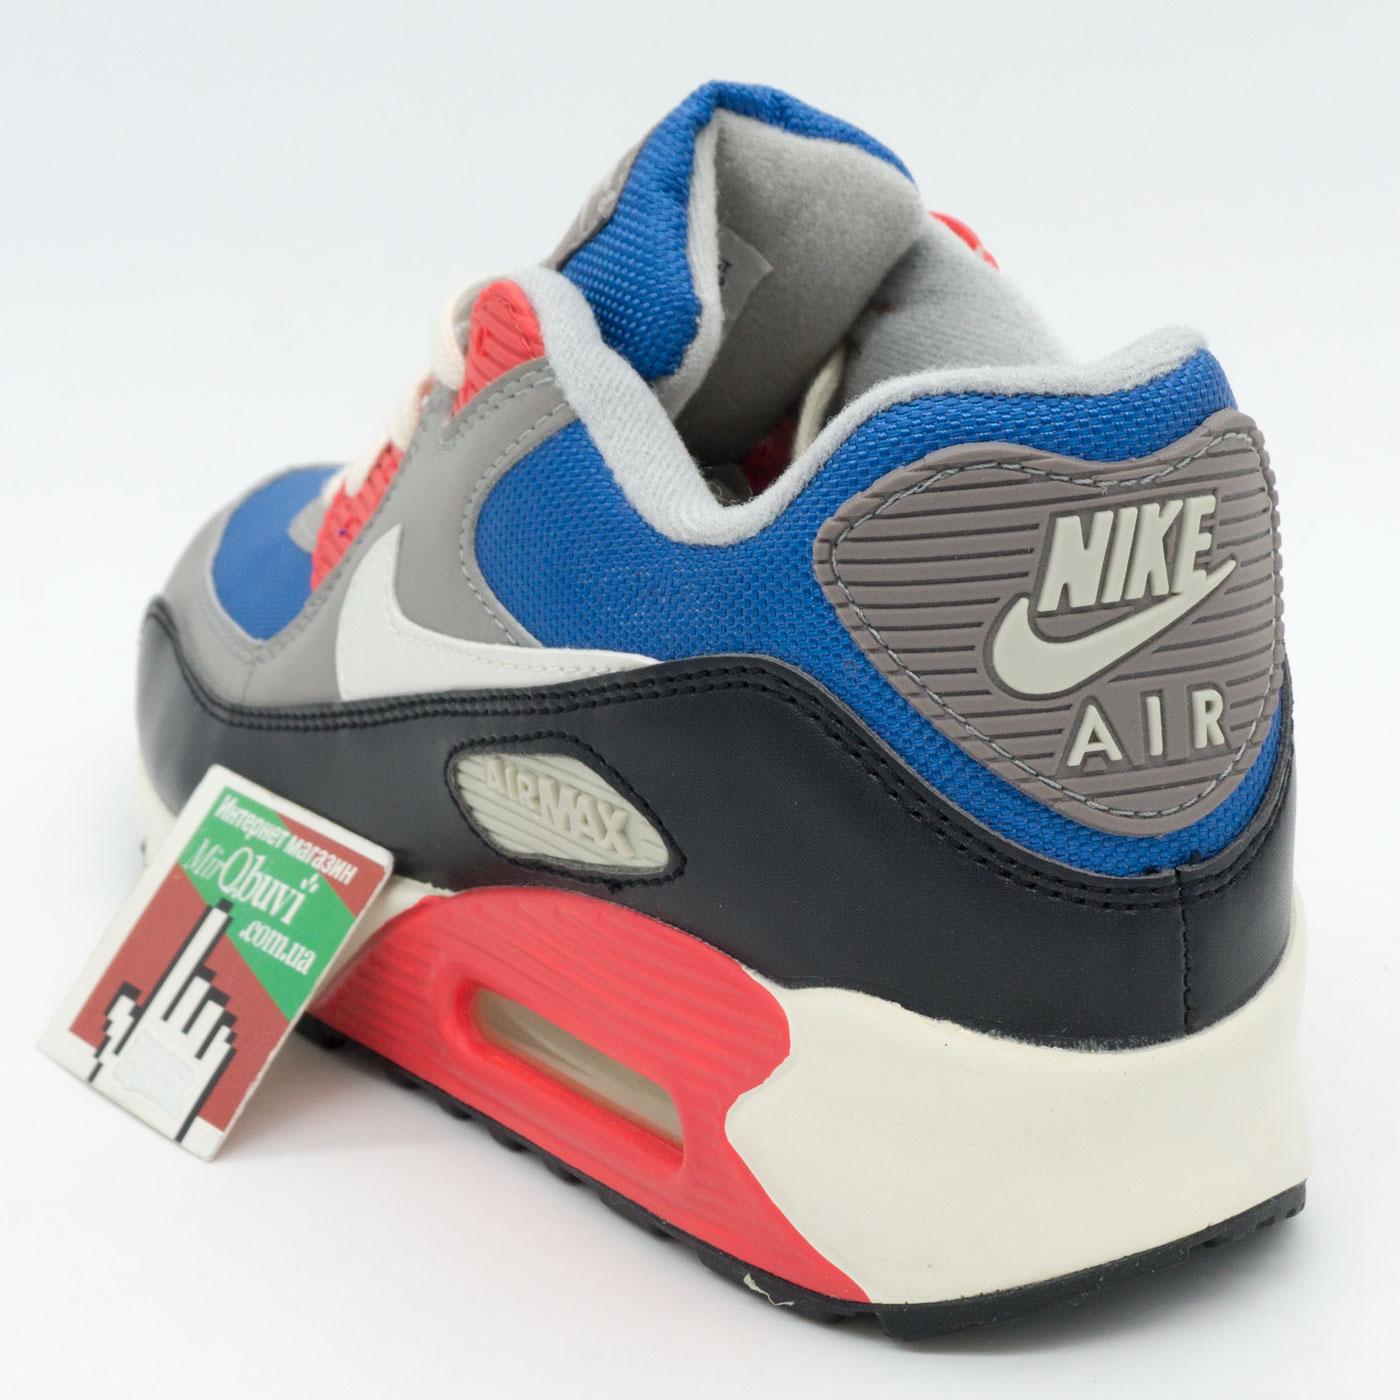 фото front Мужские кроссовки Nike Air Max 90 синие с красным front